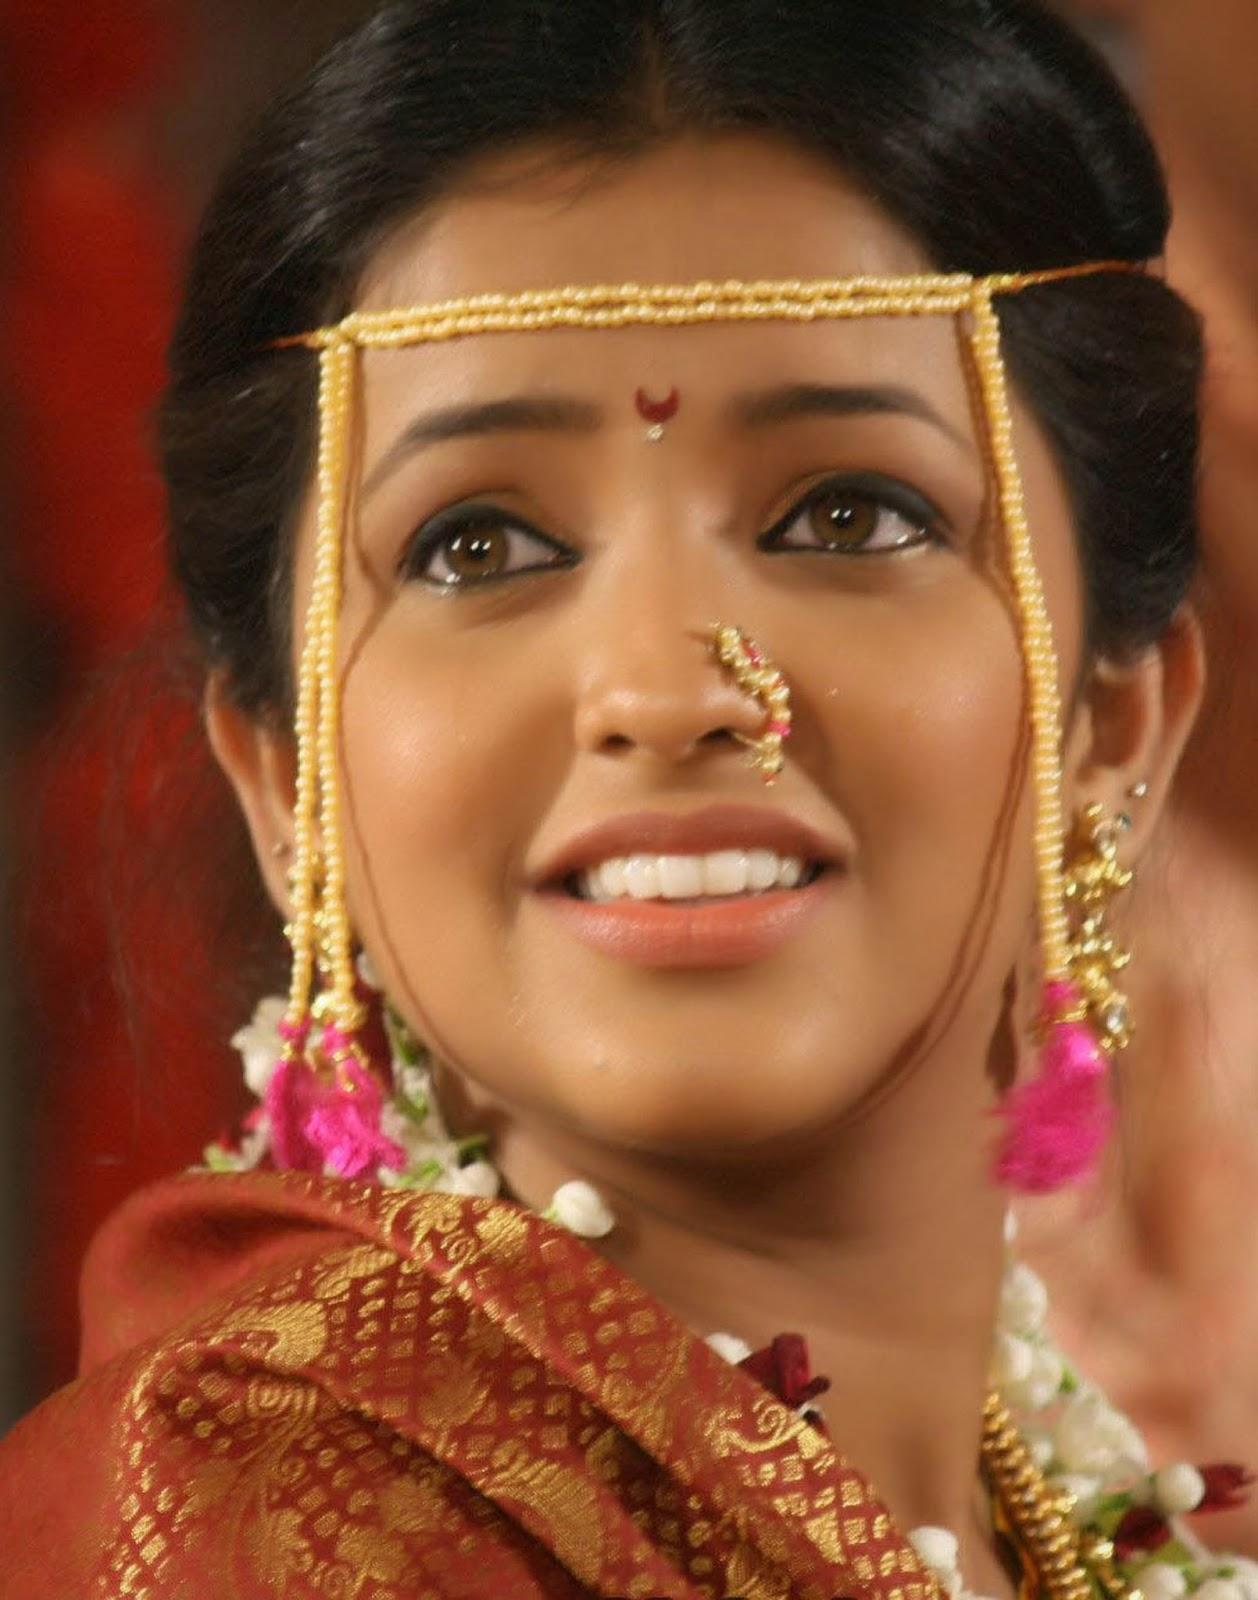 Juhi Chawla Car Wallpaper Deepika Samson Hot Sexy Girl And Car Photos